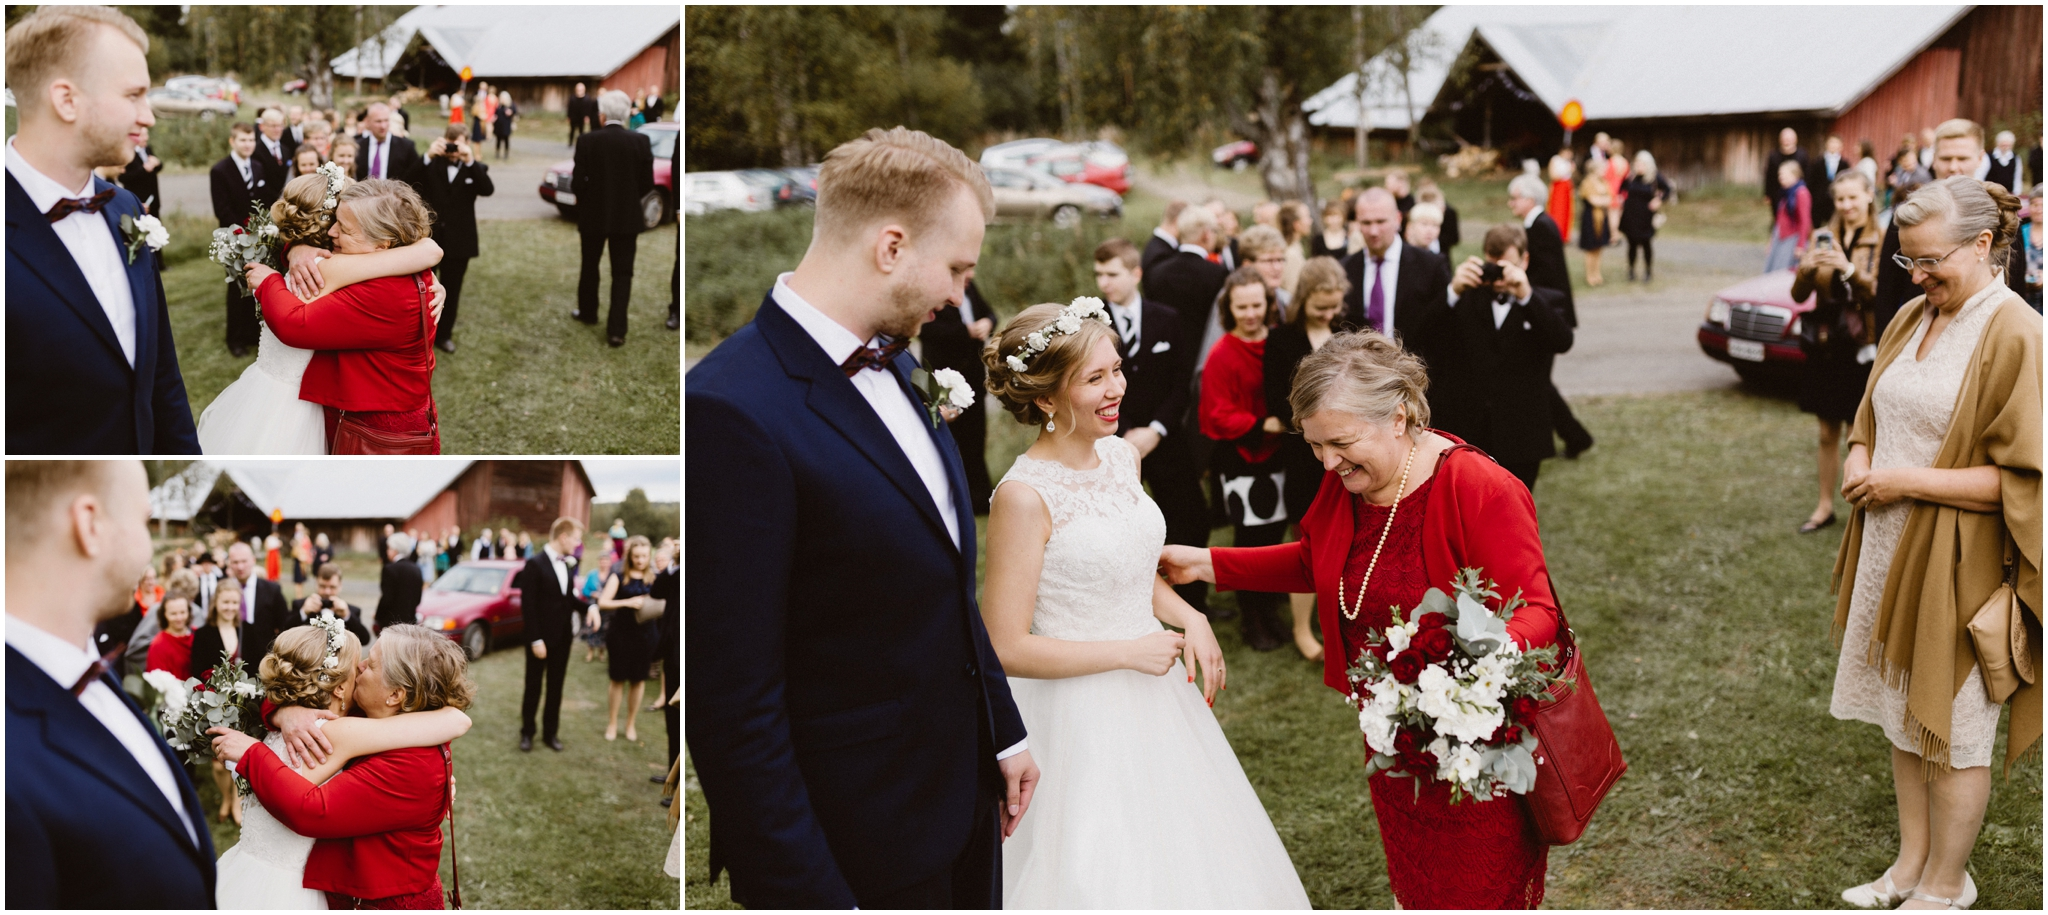 Leevi + Susanna -- Patrick Karkkolainen Wedding Photographer + Adventurer-160.jpg